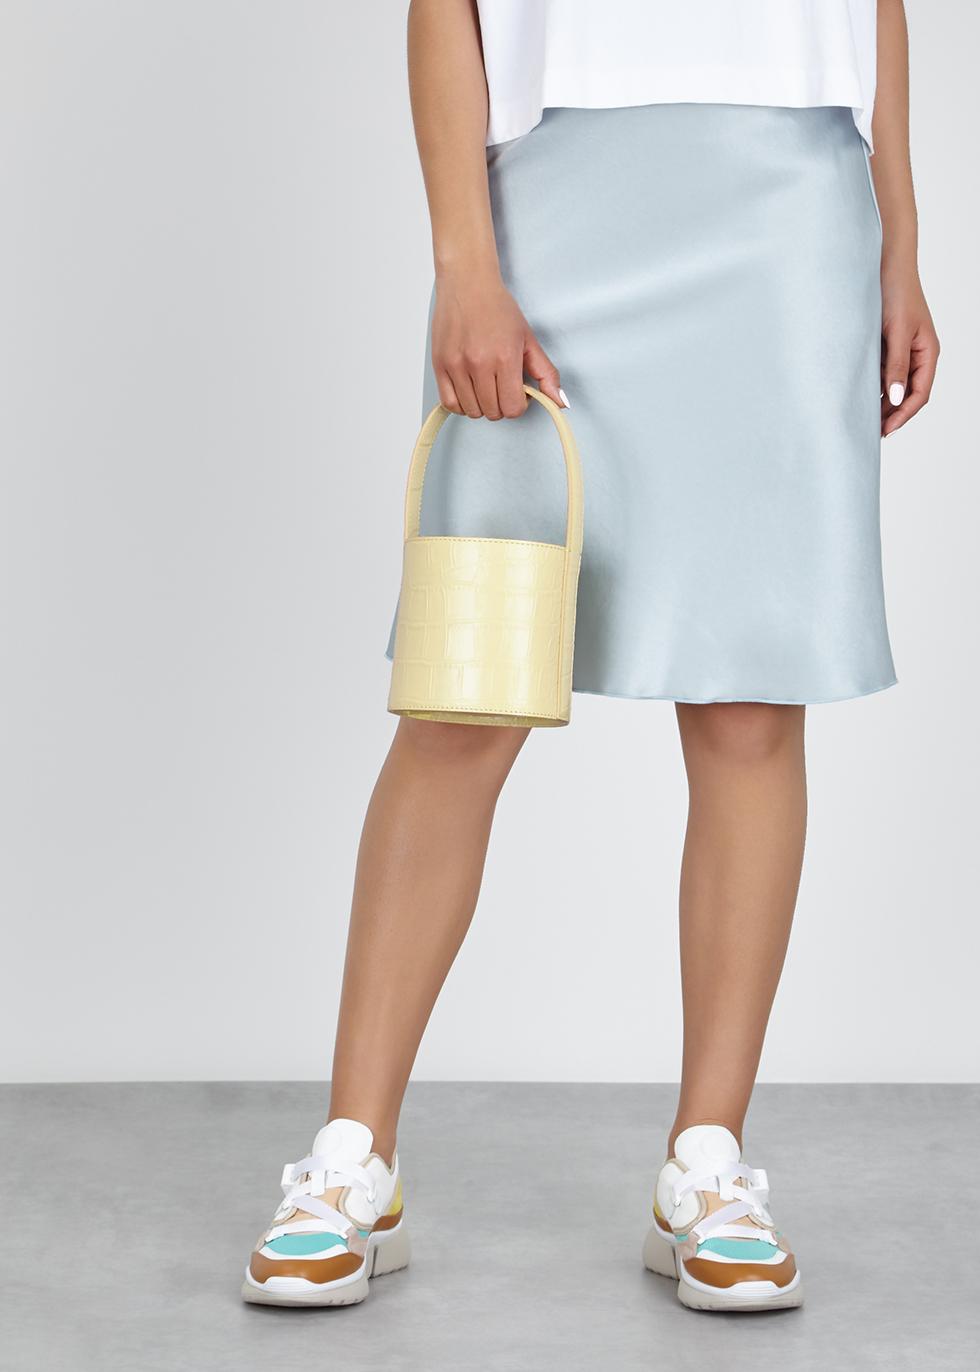 Bissett mini crocodile-effect bucket bag - STAUD